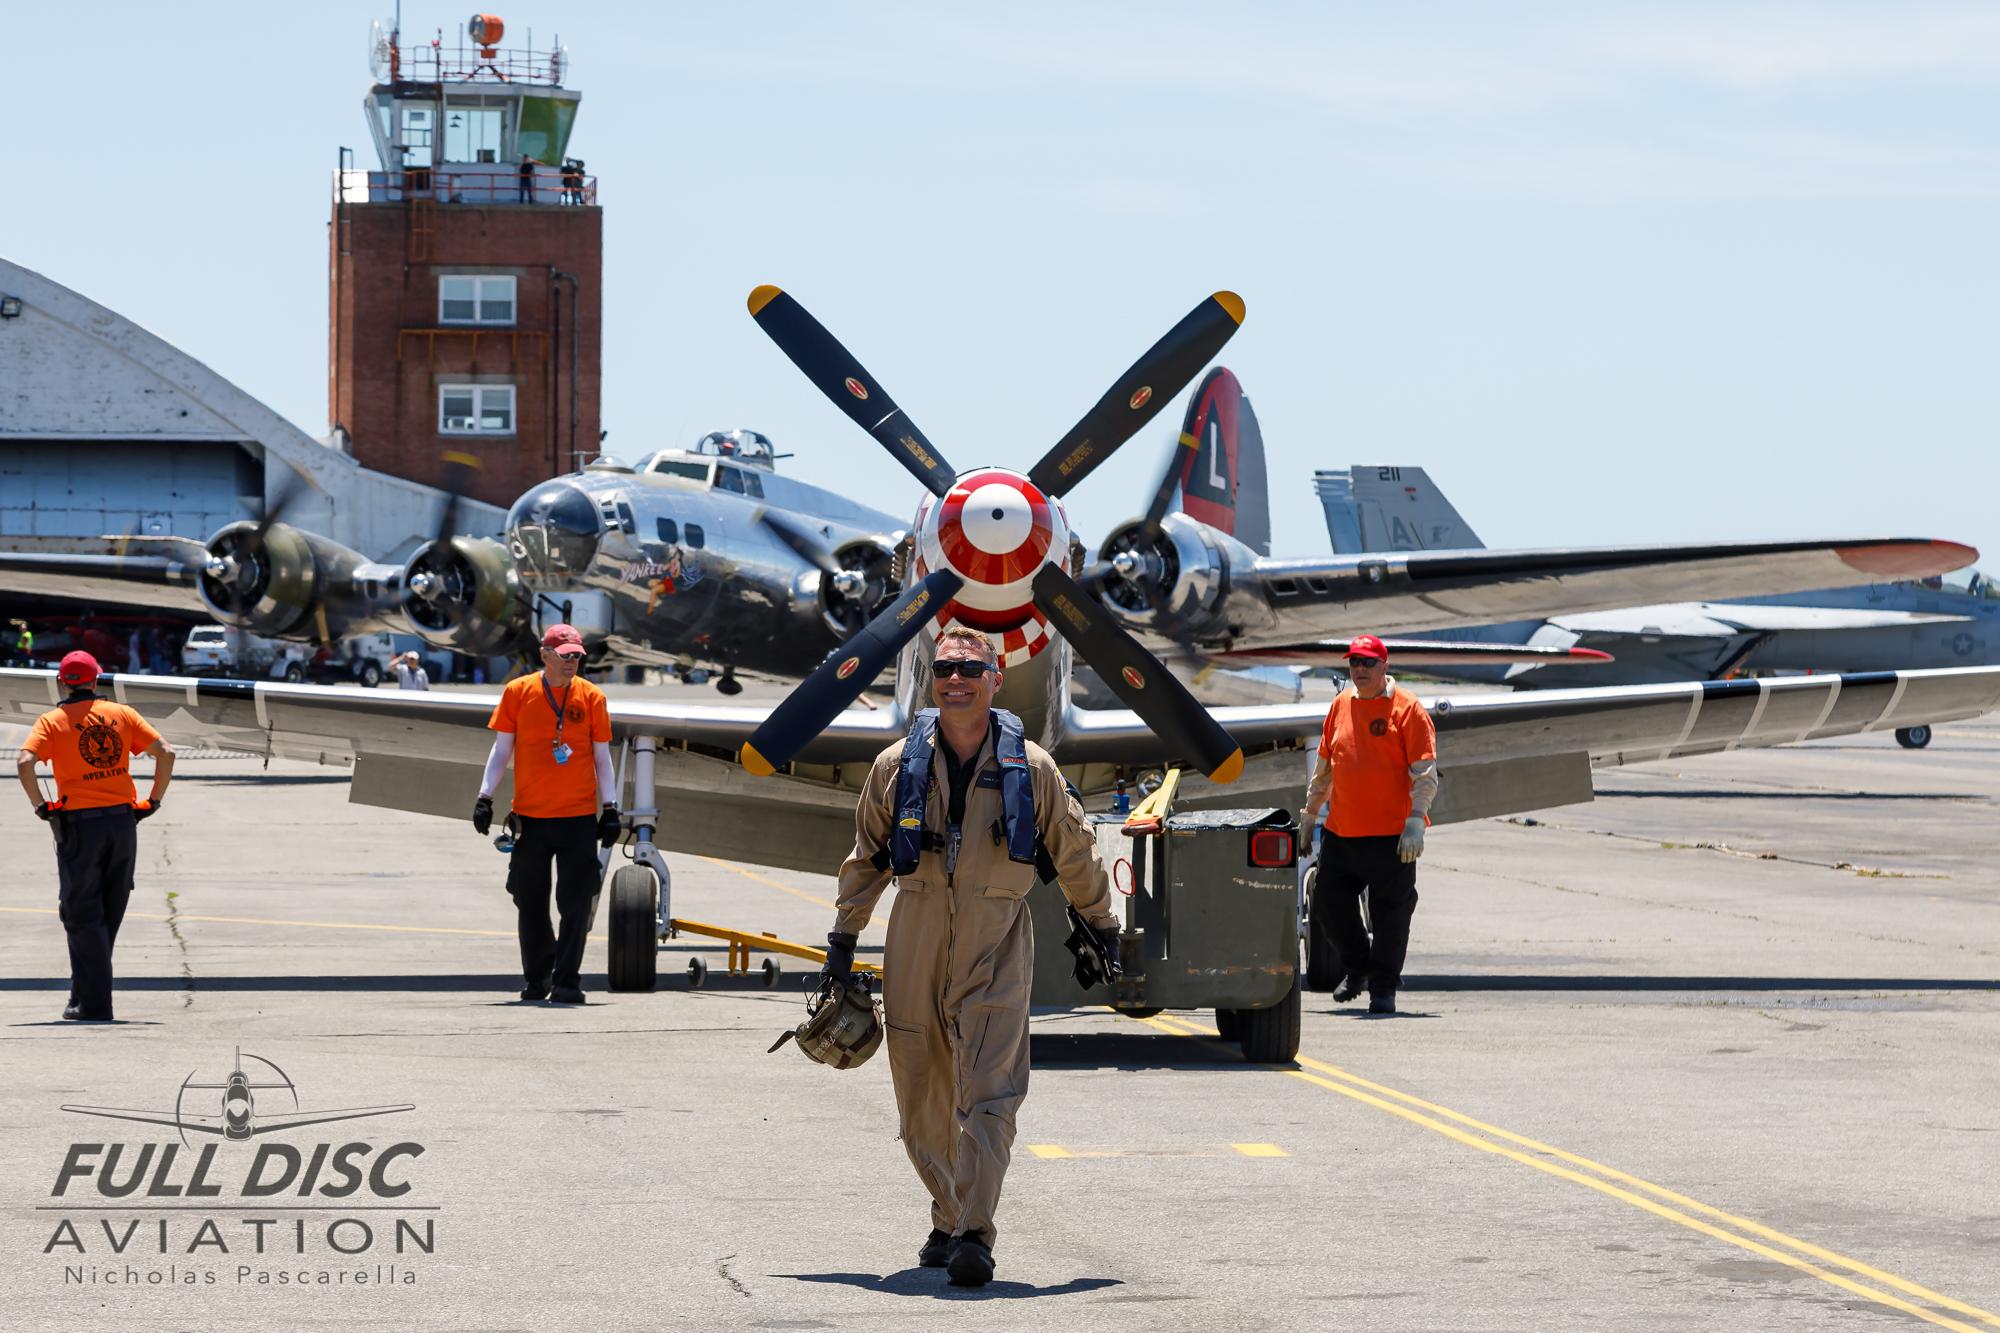 americanairpowermuseum_nicholaspascarella_nickpascarella_fulldiscaviation_legendsofairpower2019_aviation_warbird_p51_b17_thomrichard_smile.jpg